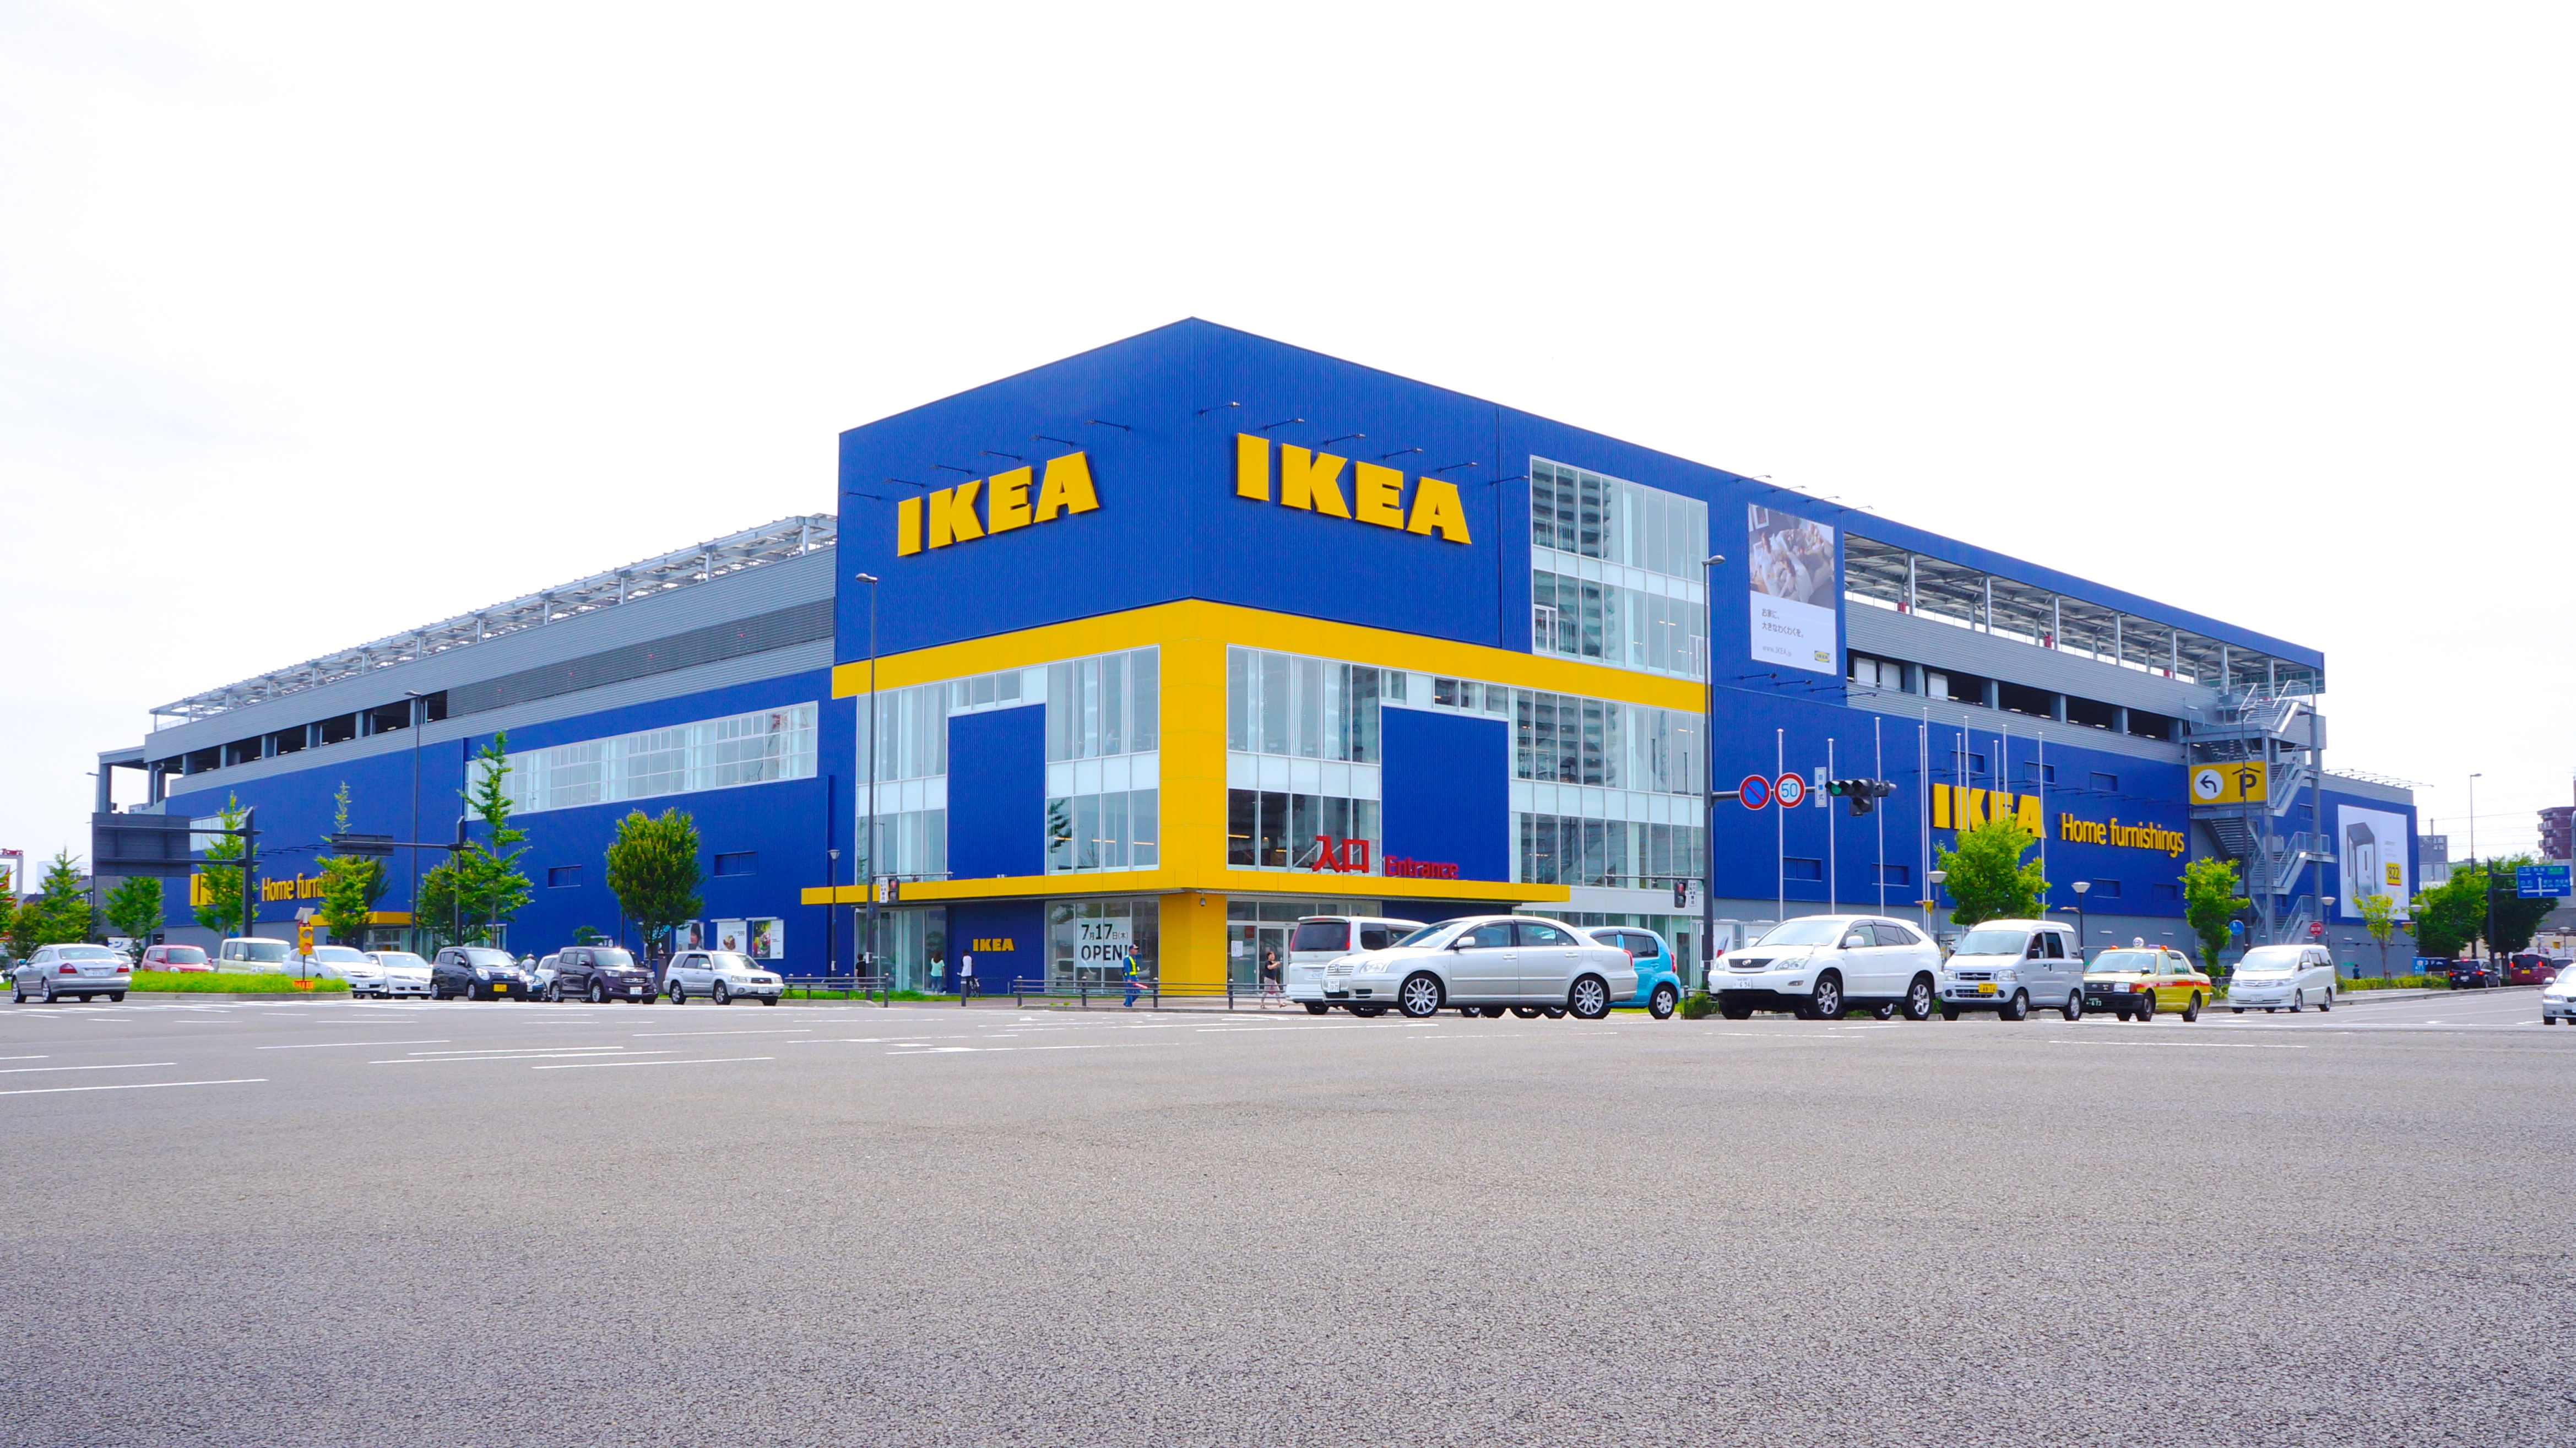 Ikea Based In Conshohocken Will Shrink Its Footprint In The Uk